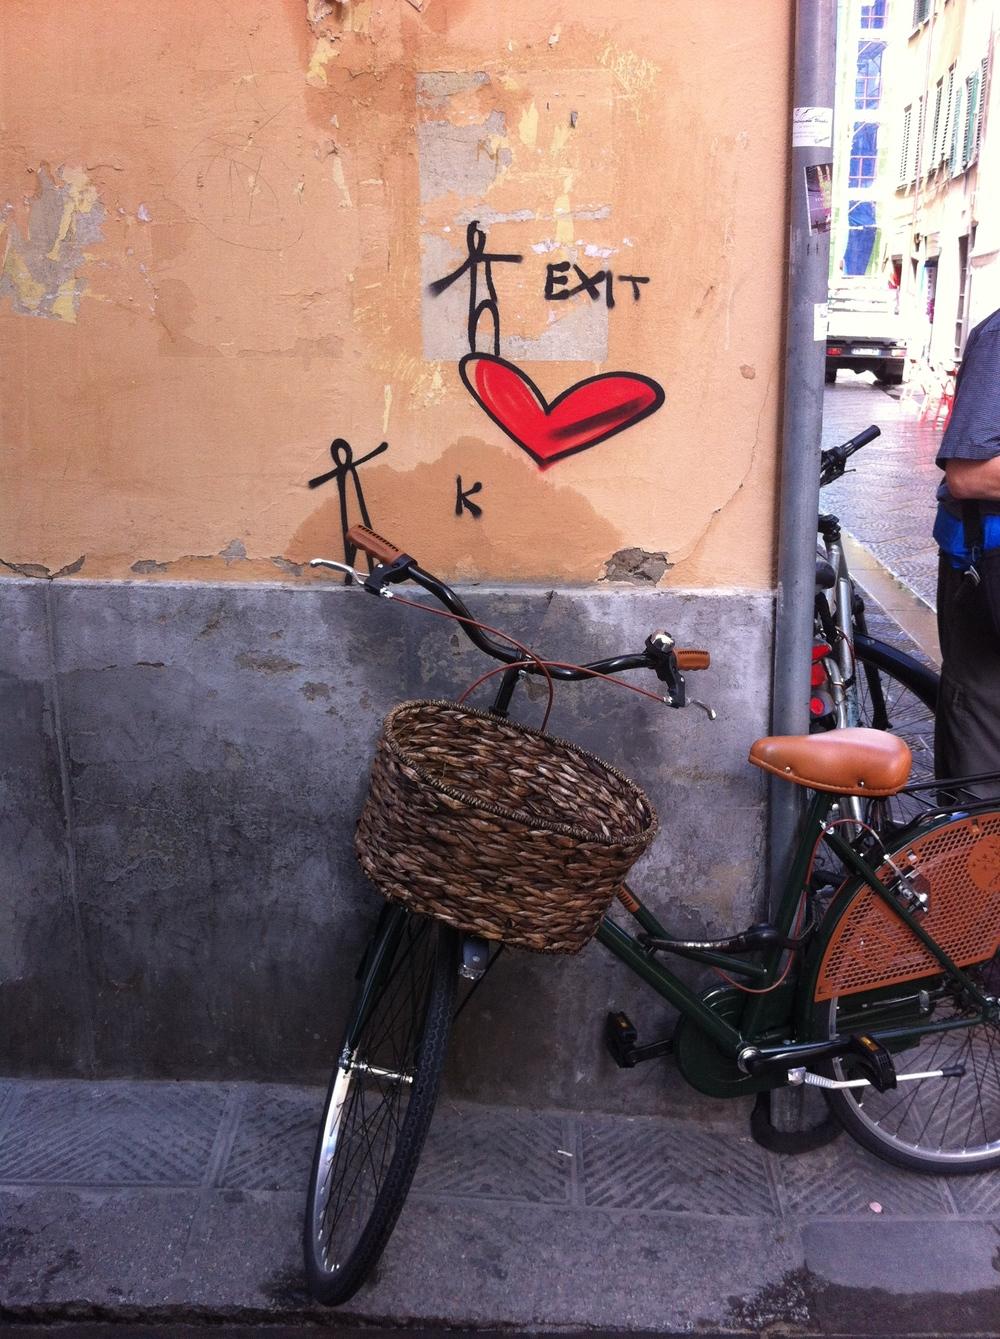 Exit bike